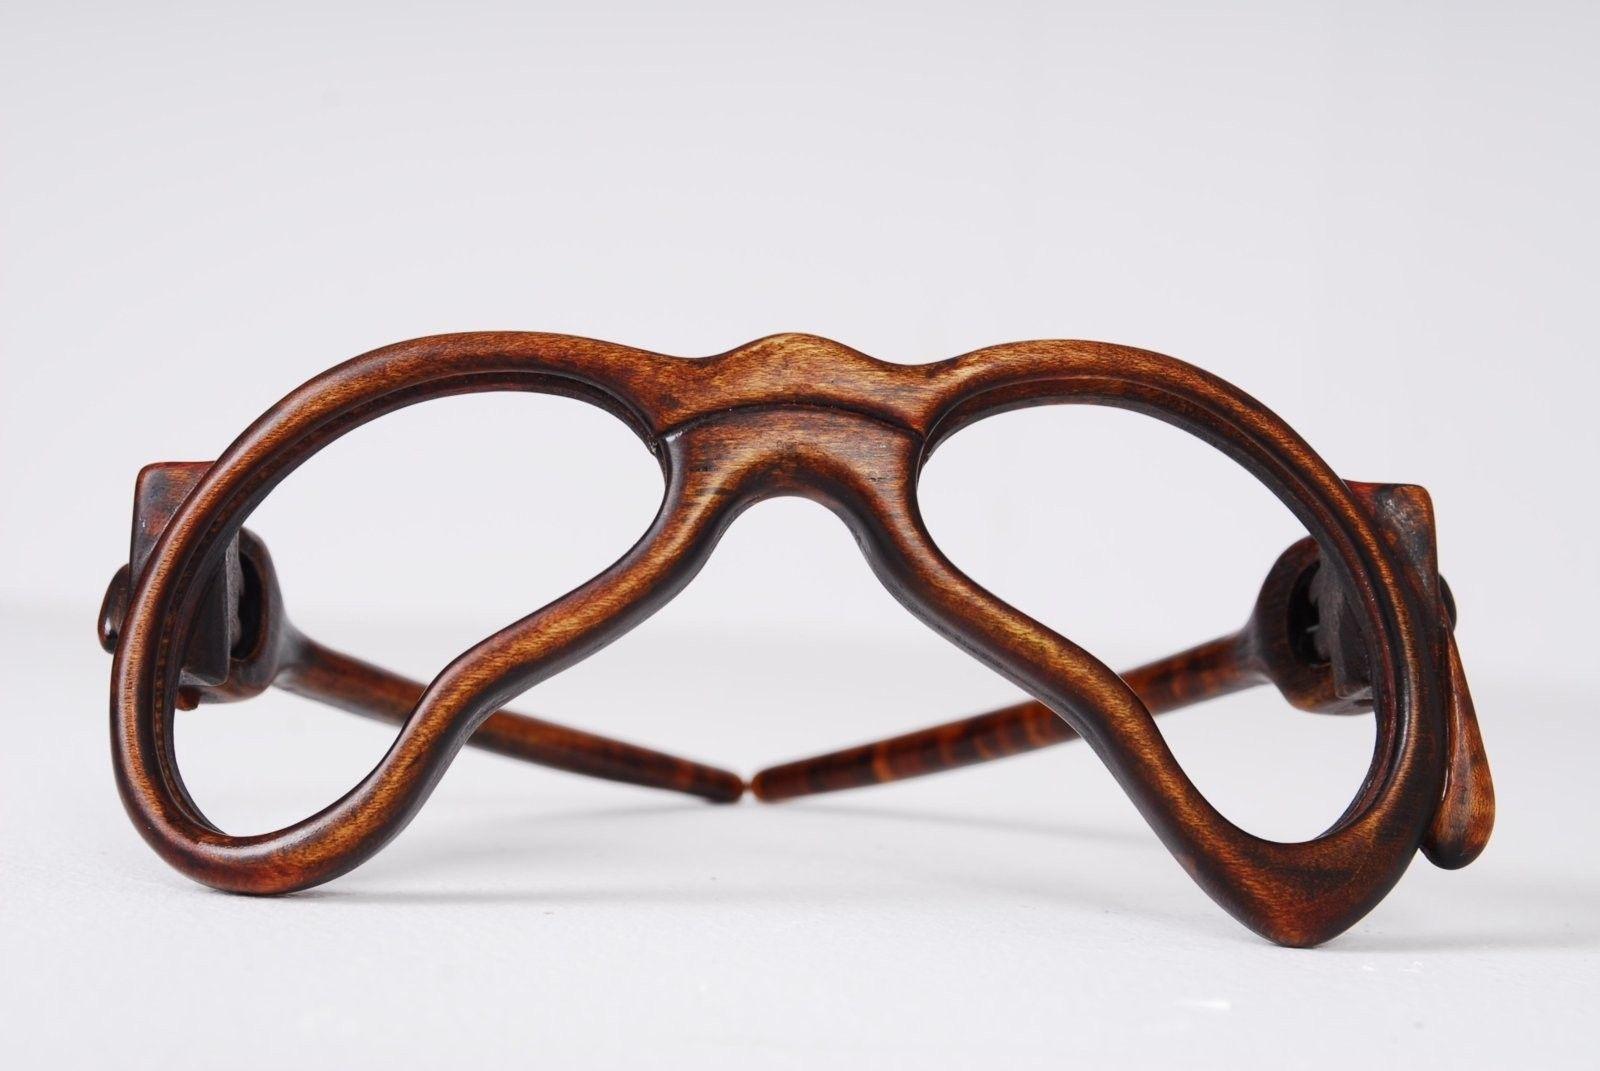 Spectacular Handmade Wooden Sunglasses - 2016-05 Jaromir Dali 14.JPG